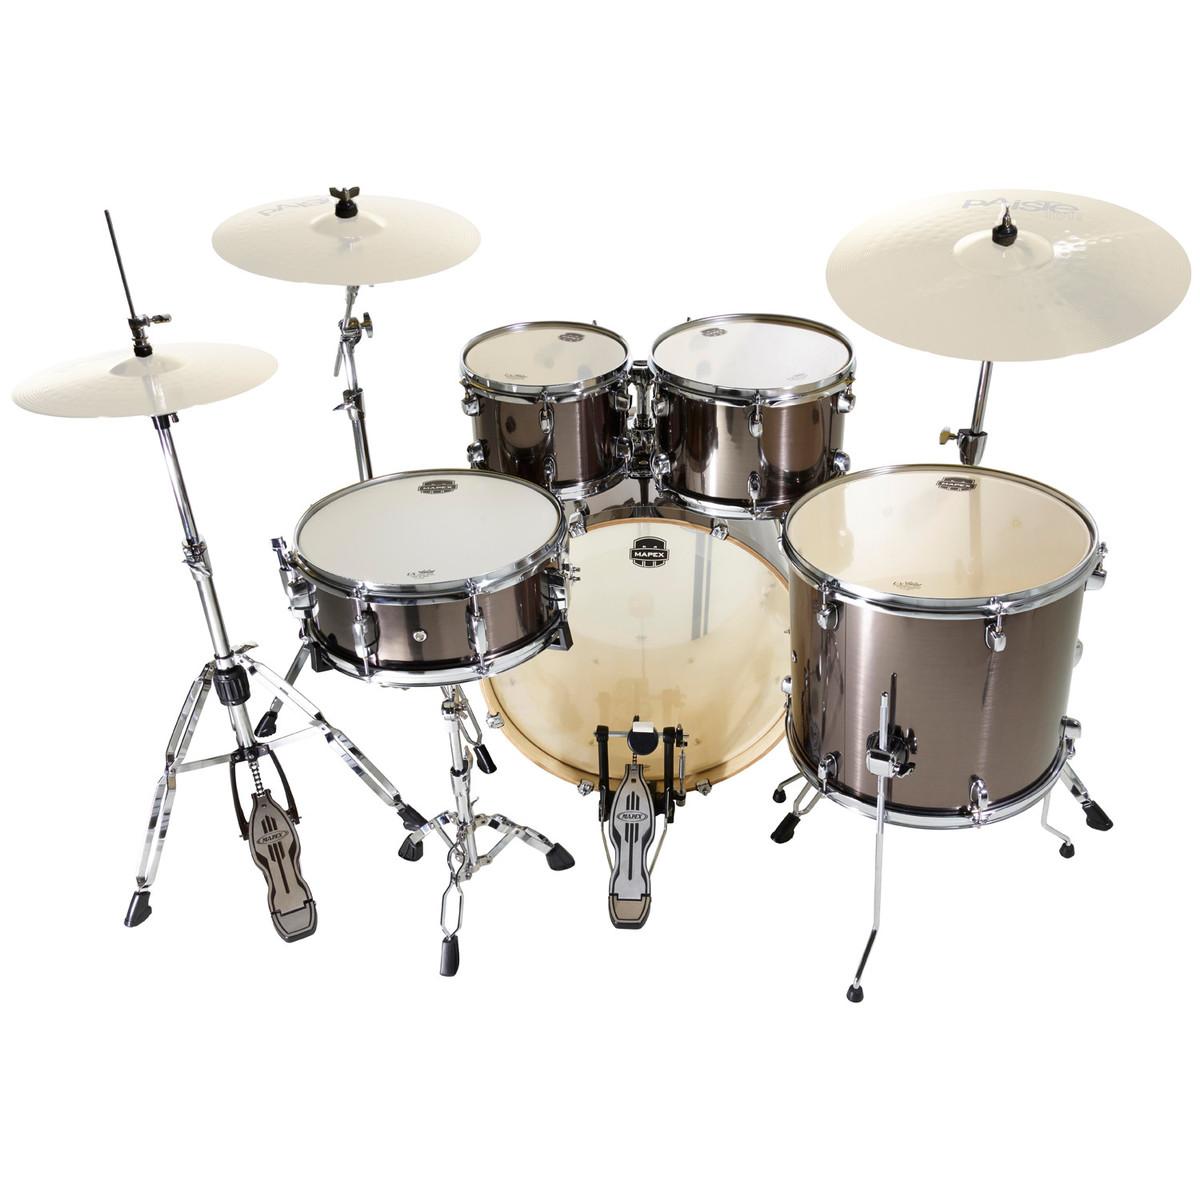 mapex horizon ii 22 39 39 rock fusion drum kit grey steel at gear4music. Black Bedroom Furniture Sets. Home Design Ideas